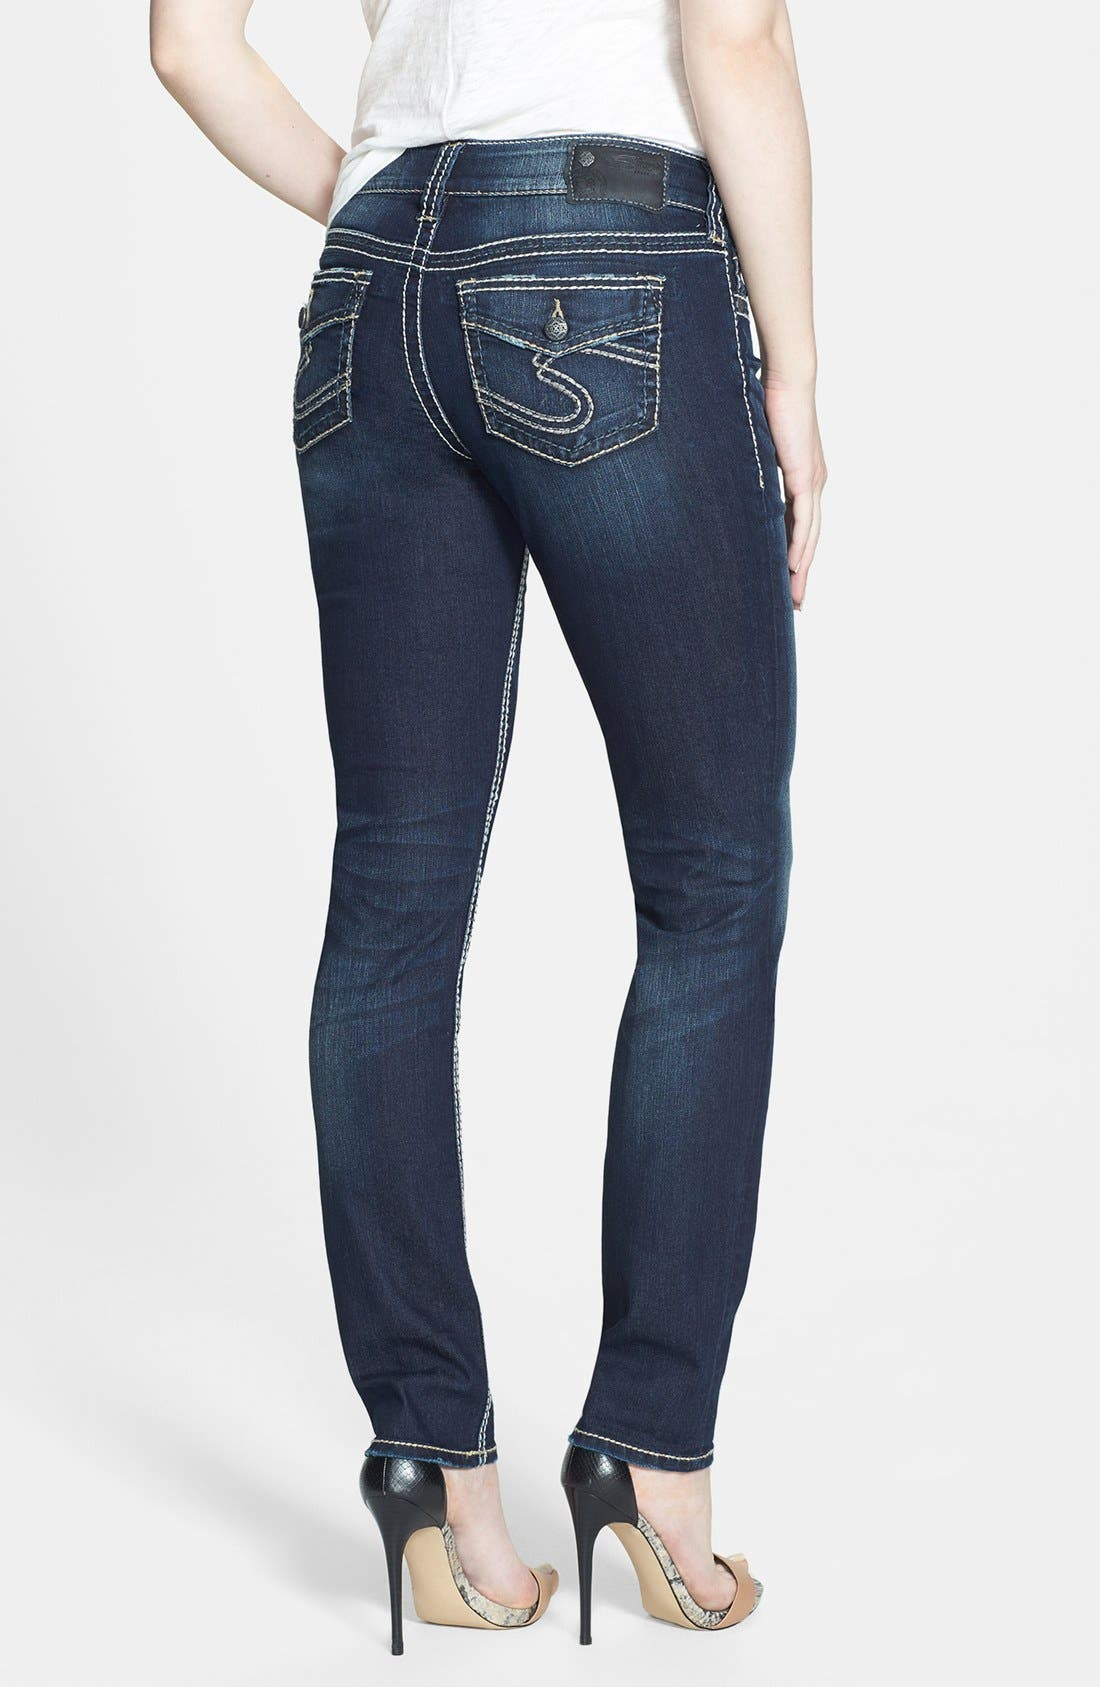 Alternate Image 2  - Silver Jeans Co. 'Suki' Skinny Jeans (Indigo)